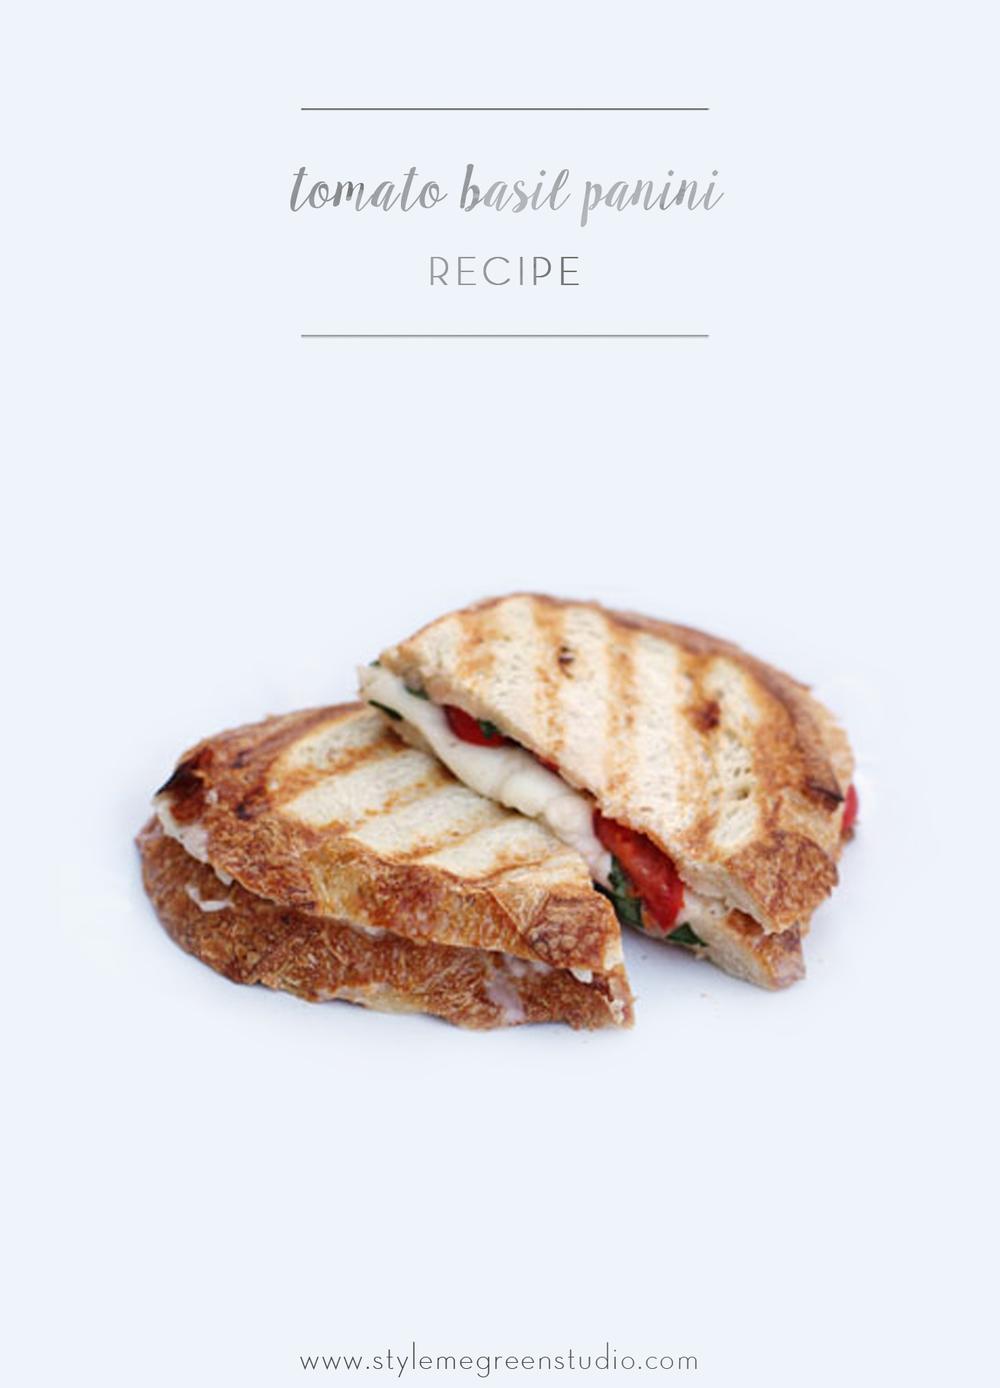 tomato basil panini recipe